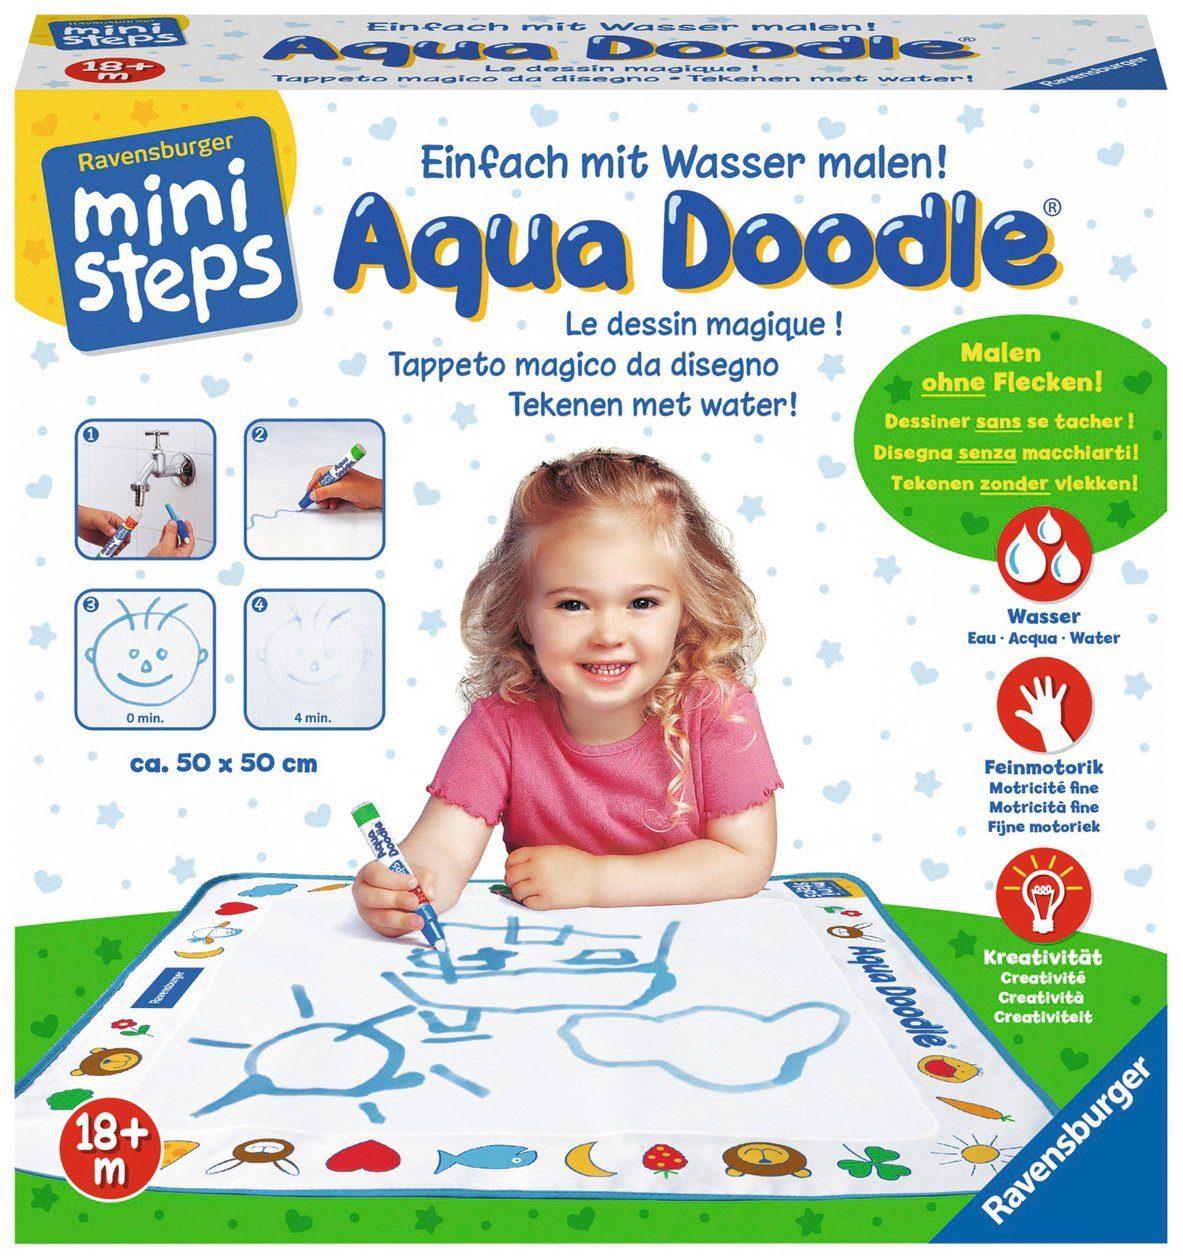 Ravensburger Set bestehend aus: Malmatte und Stift, »ministeps® Aqua Doodle®«